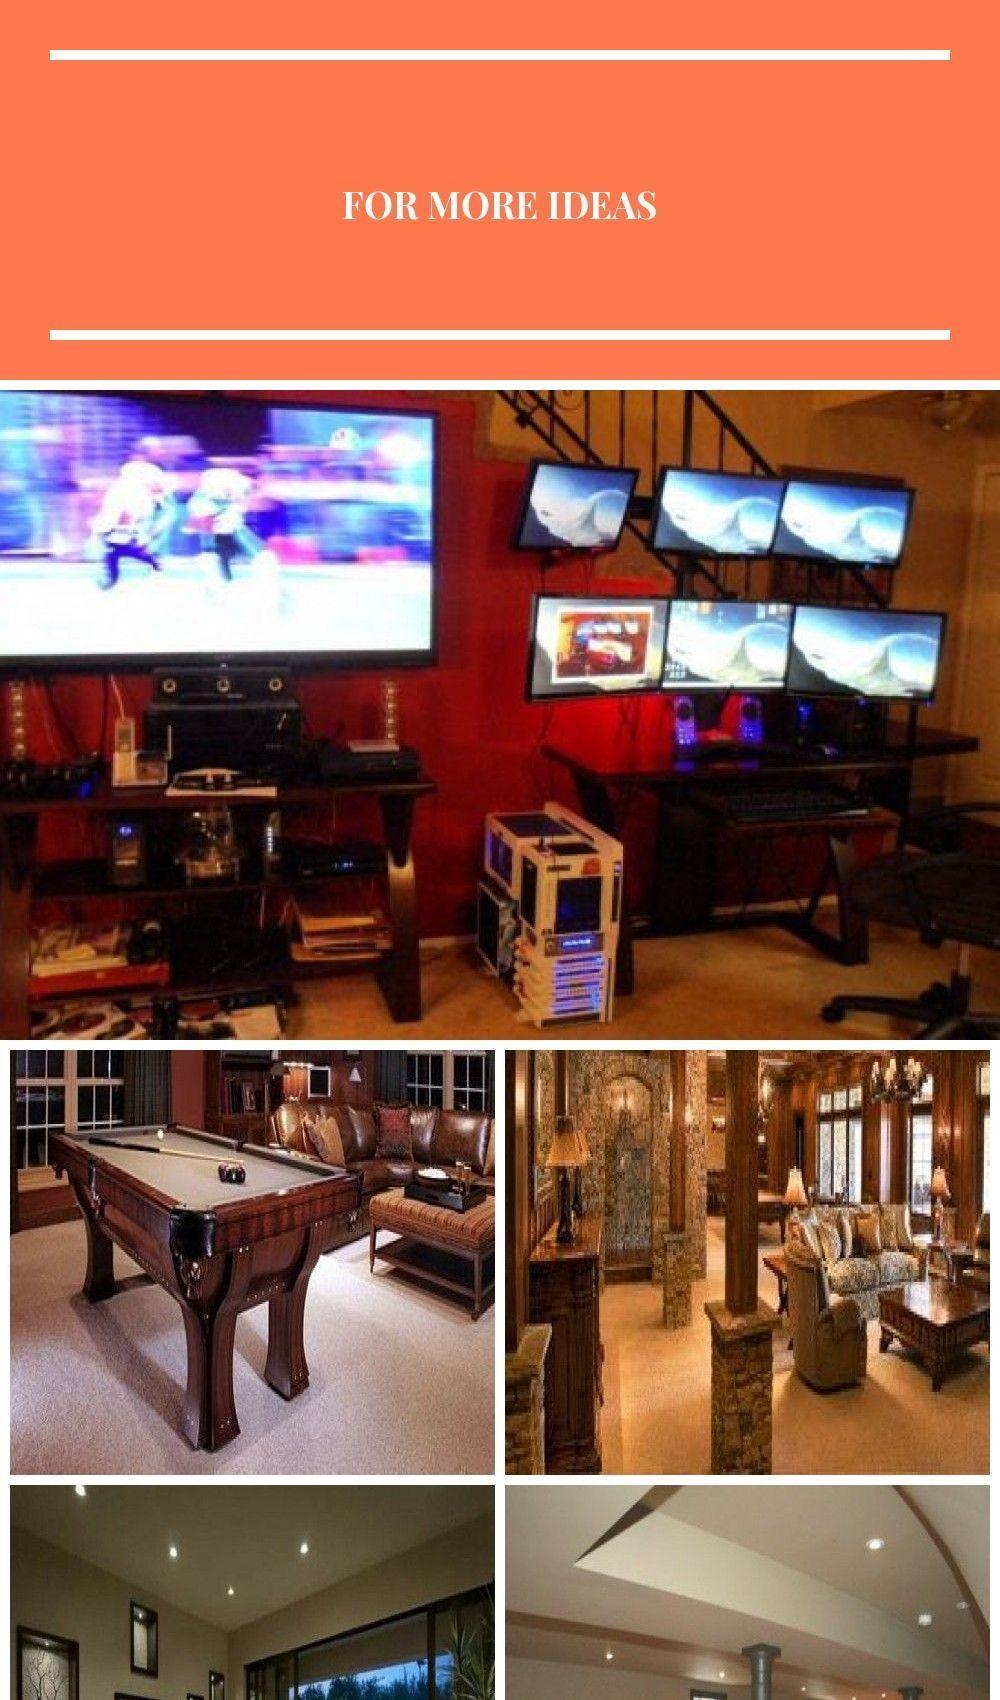 Photo of Rob Schatz's #Gaming Setup #Recreational Room #Recreational Room #Cabinets,  #Ca…